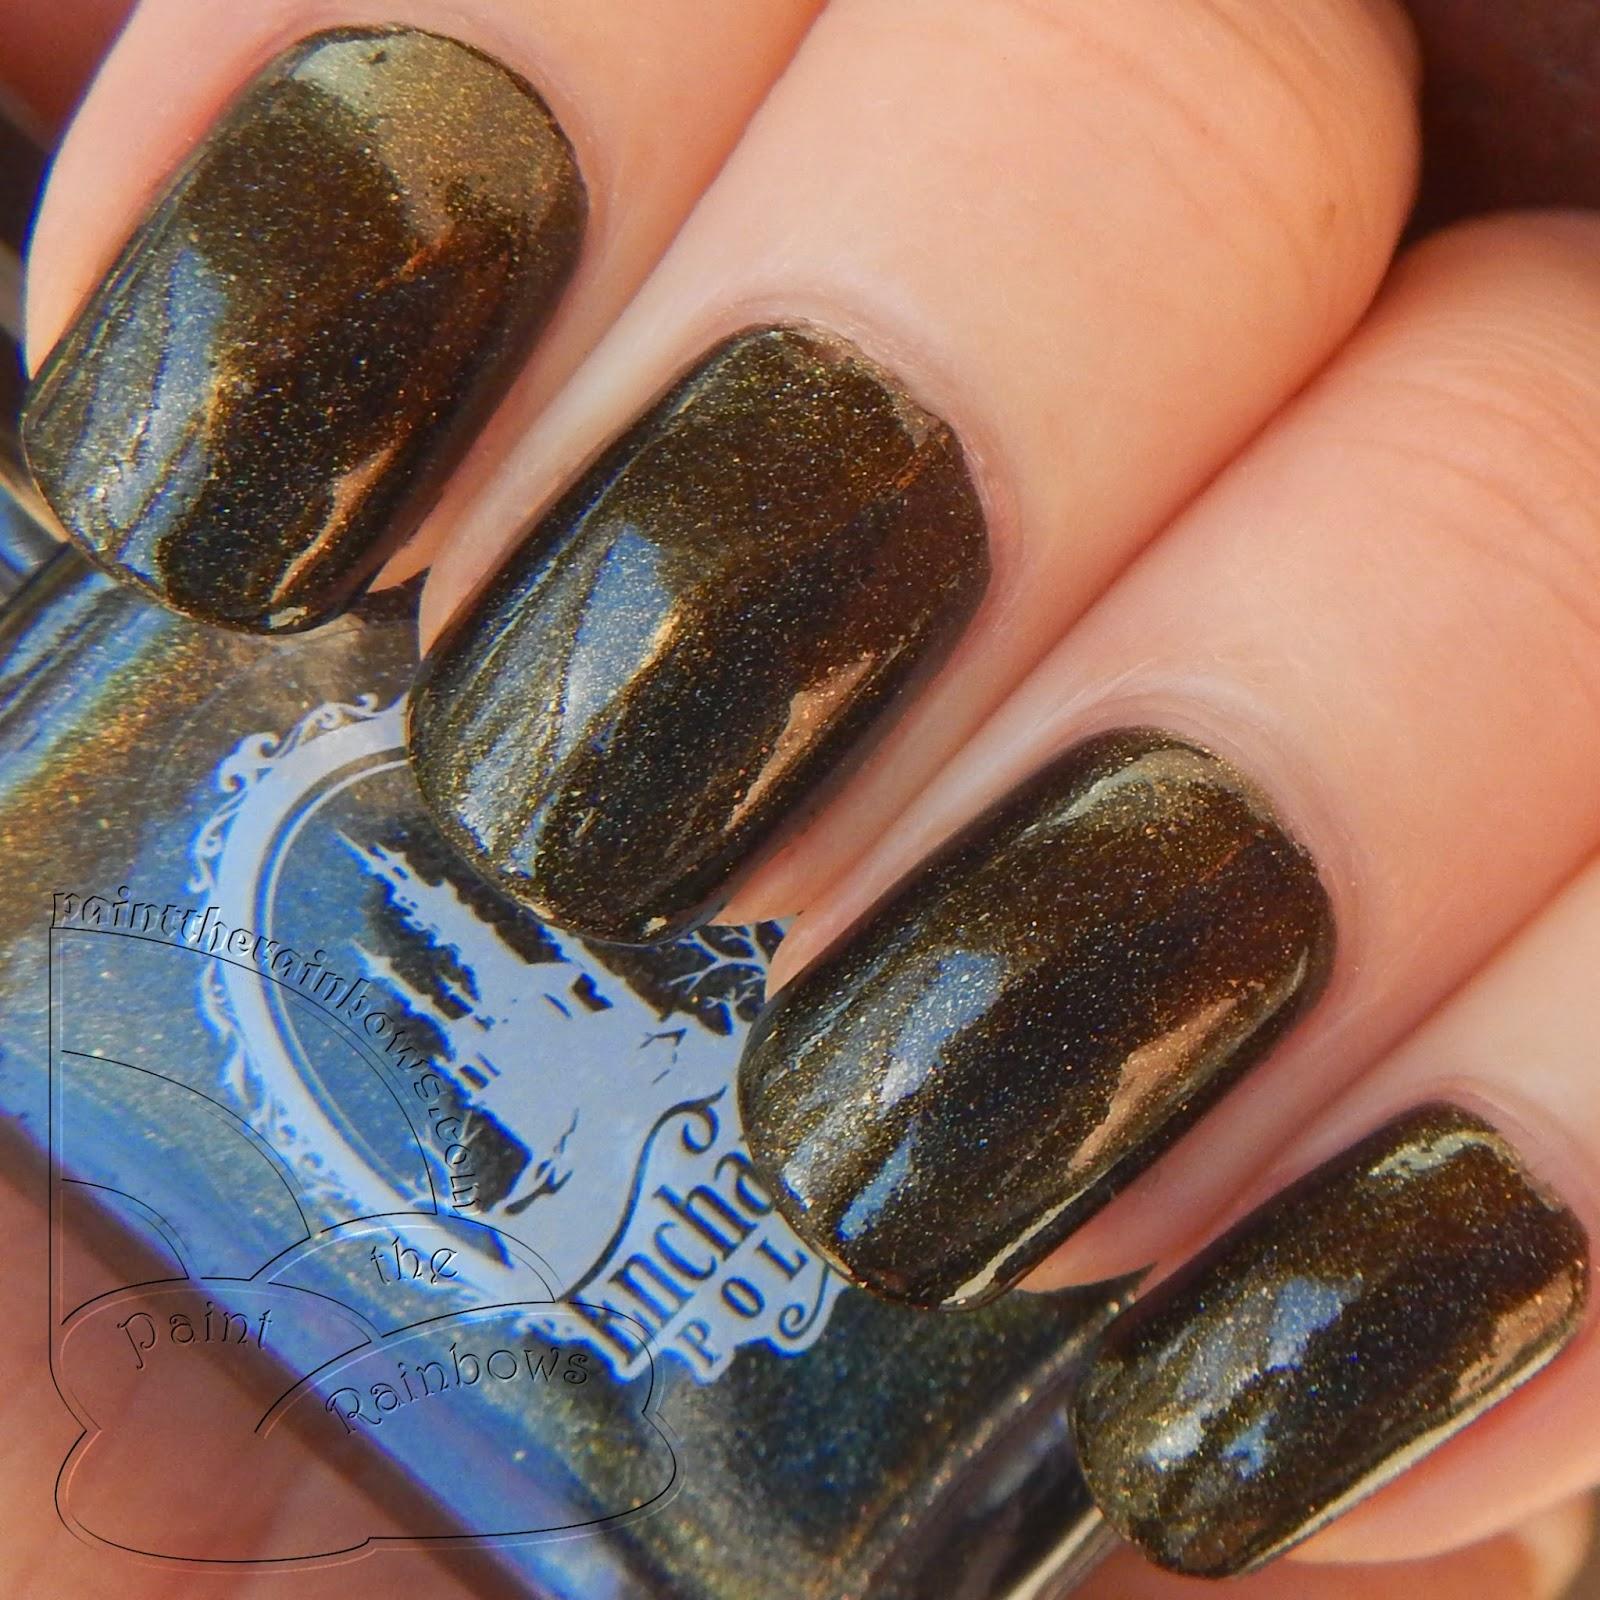 enchanted polish october 2014